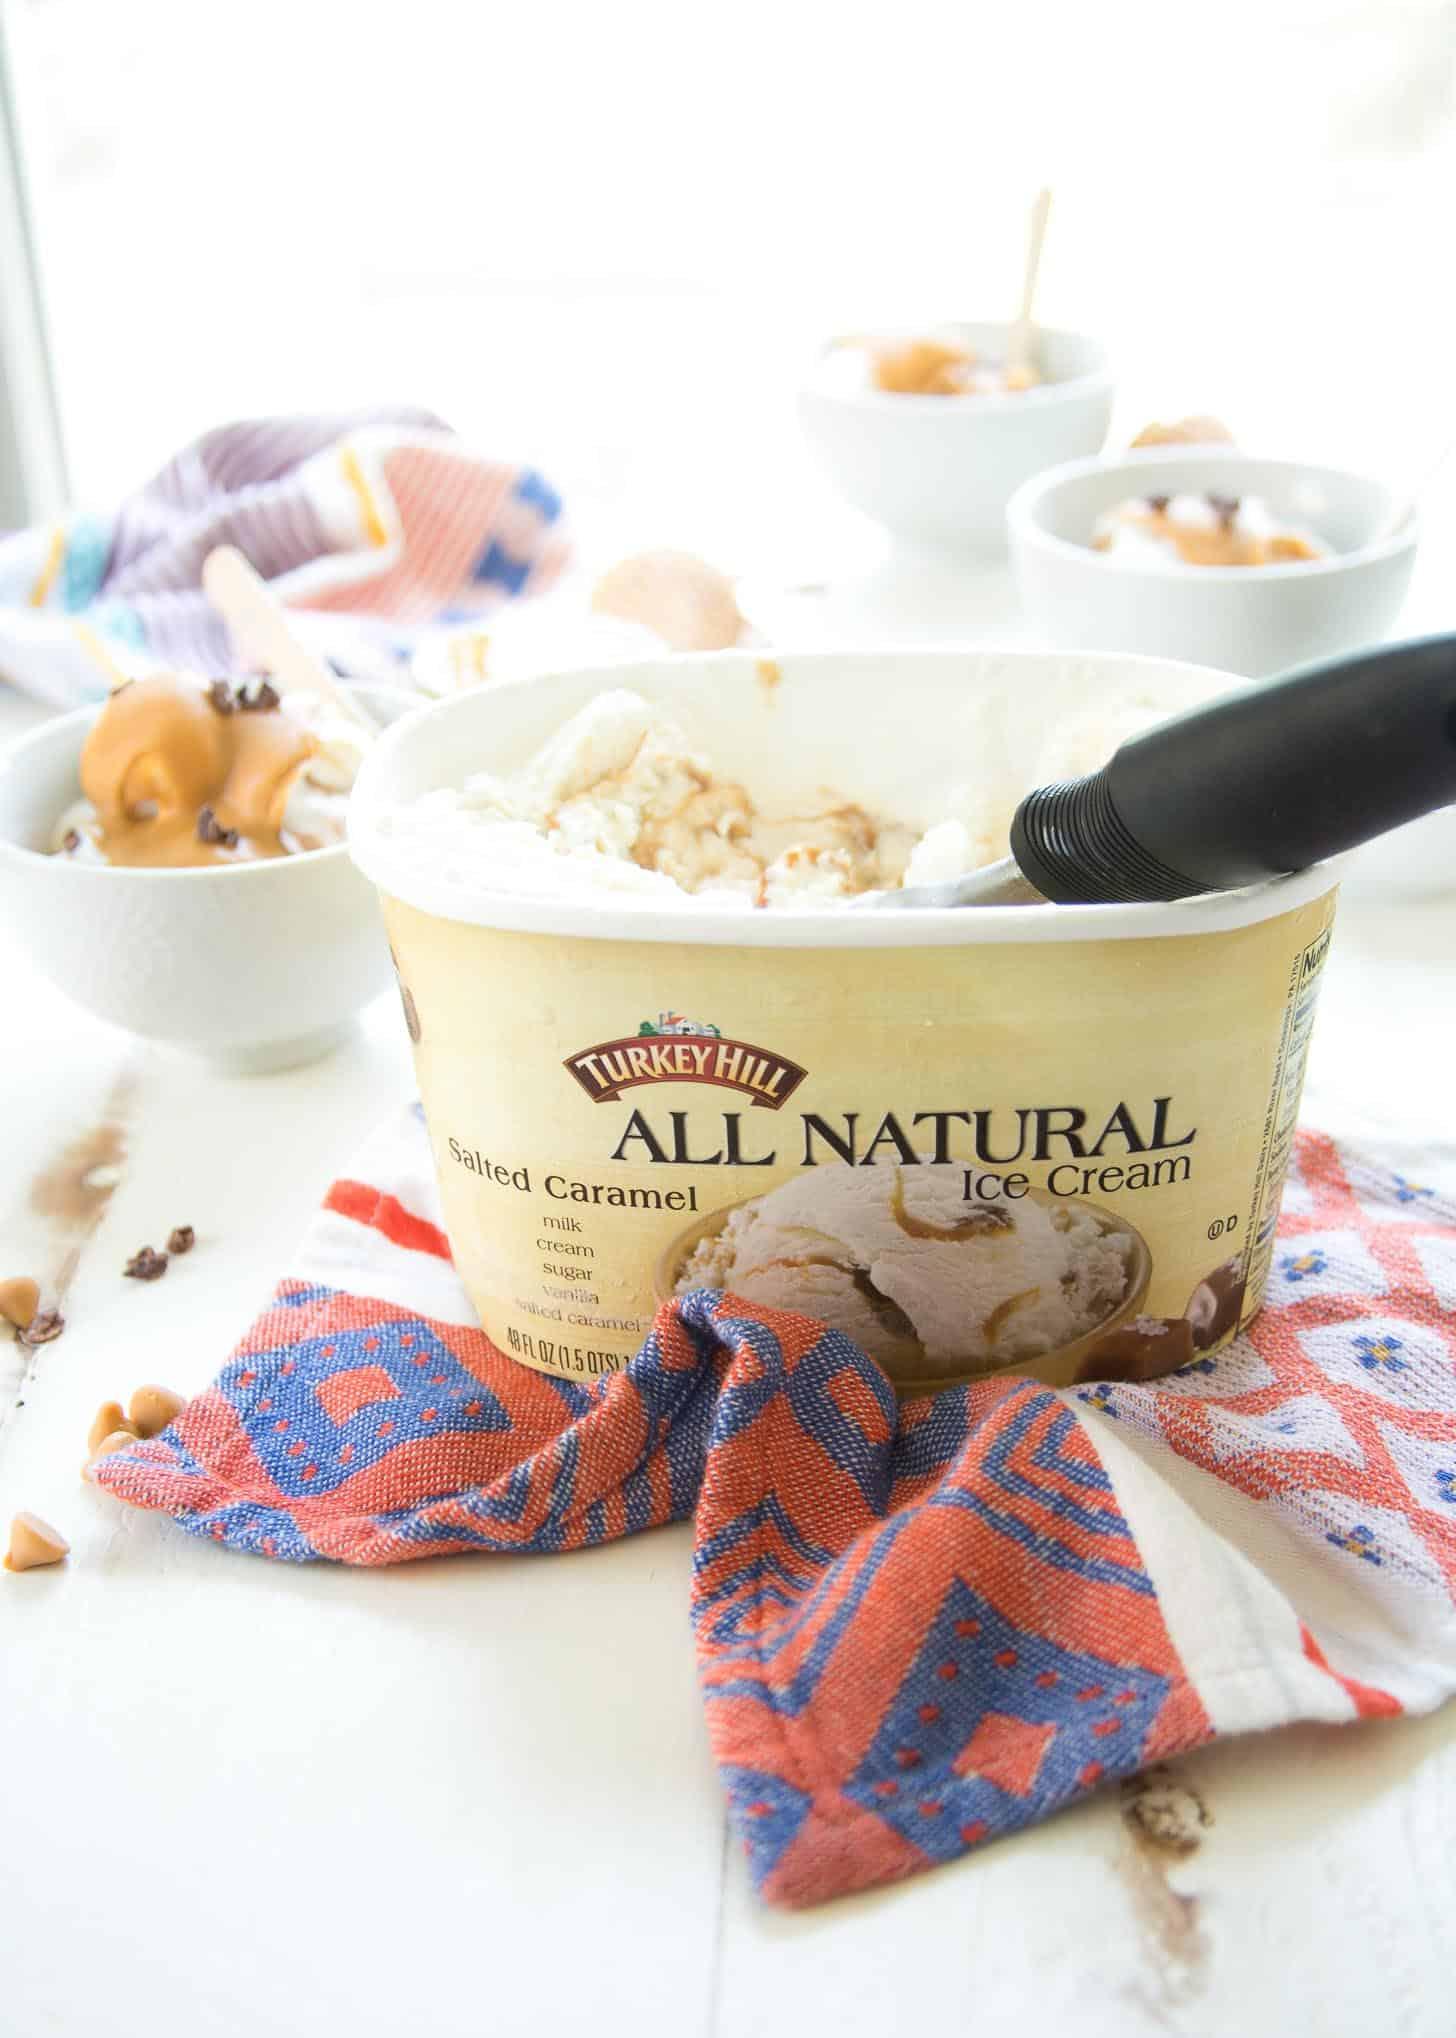 ice cream with a scoop